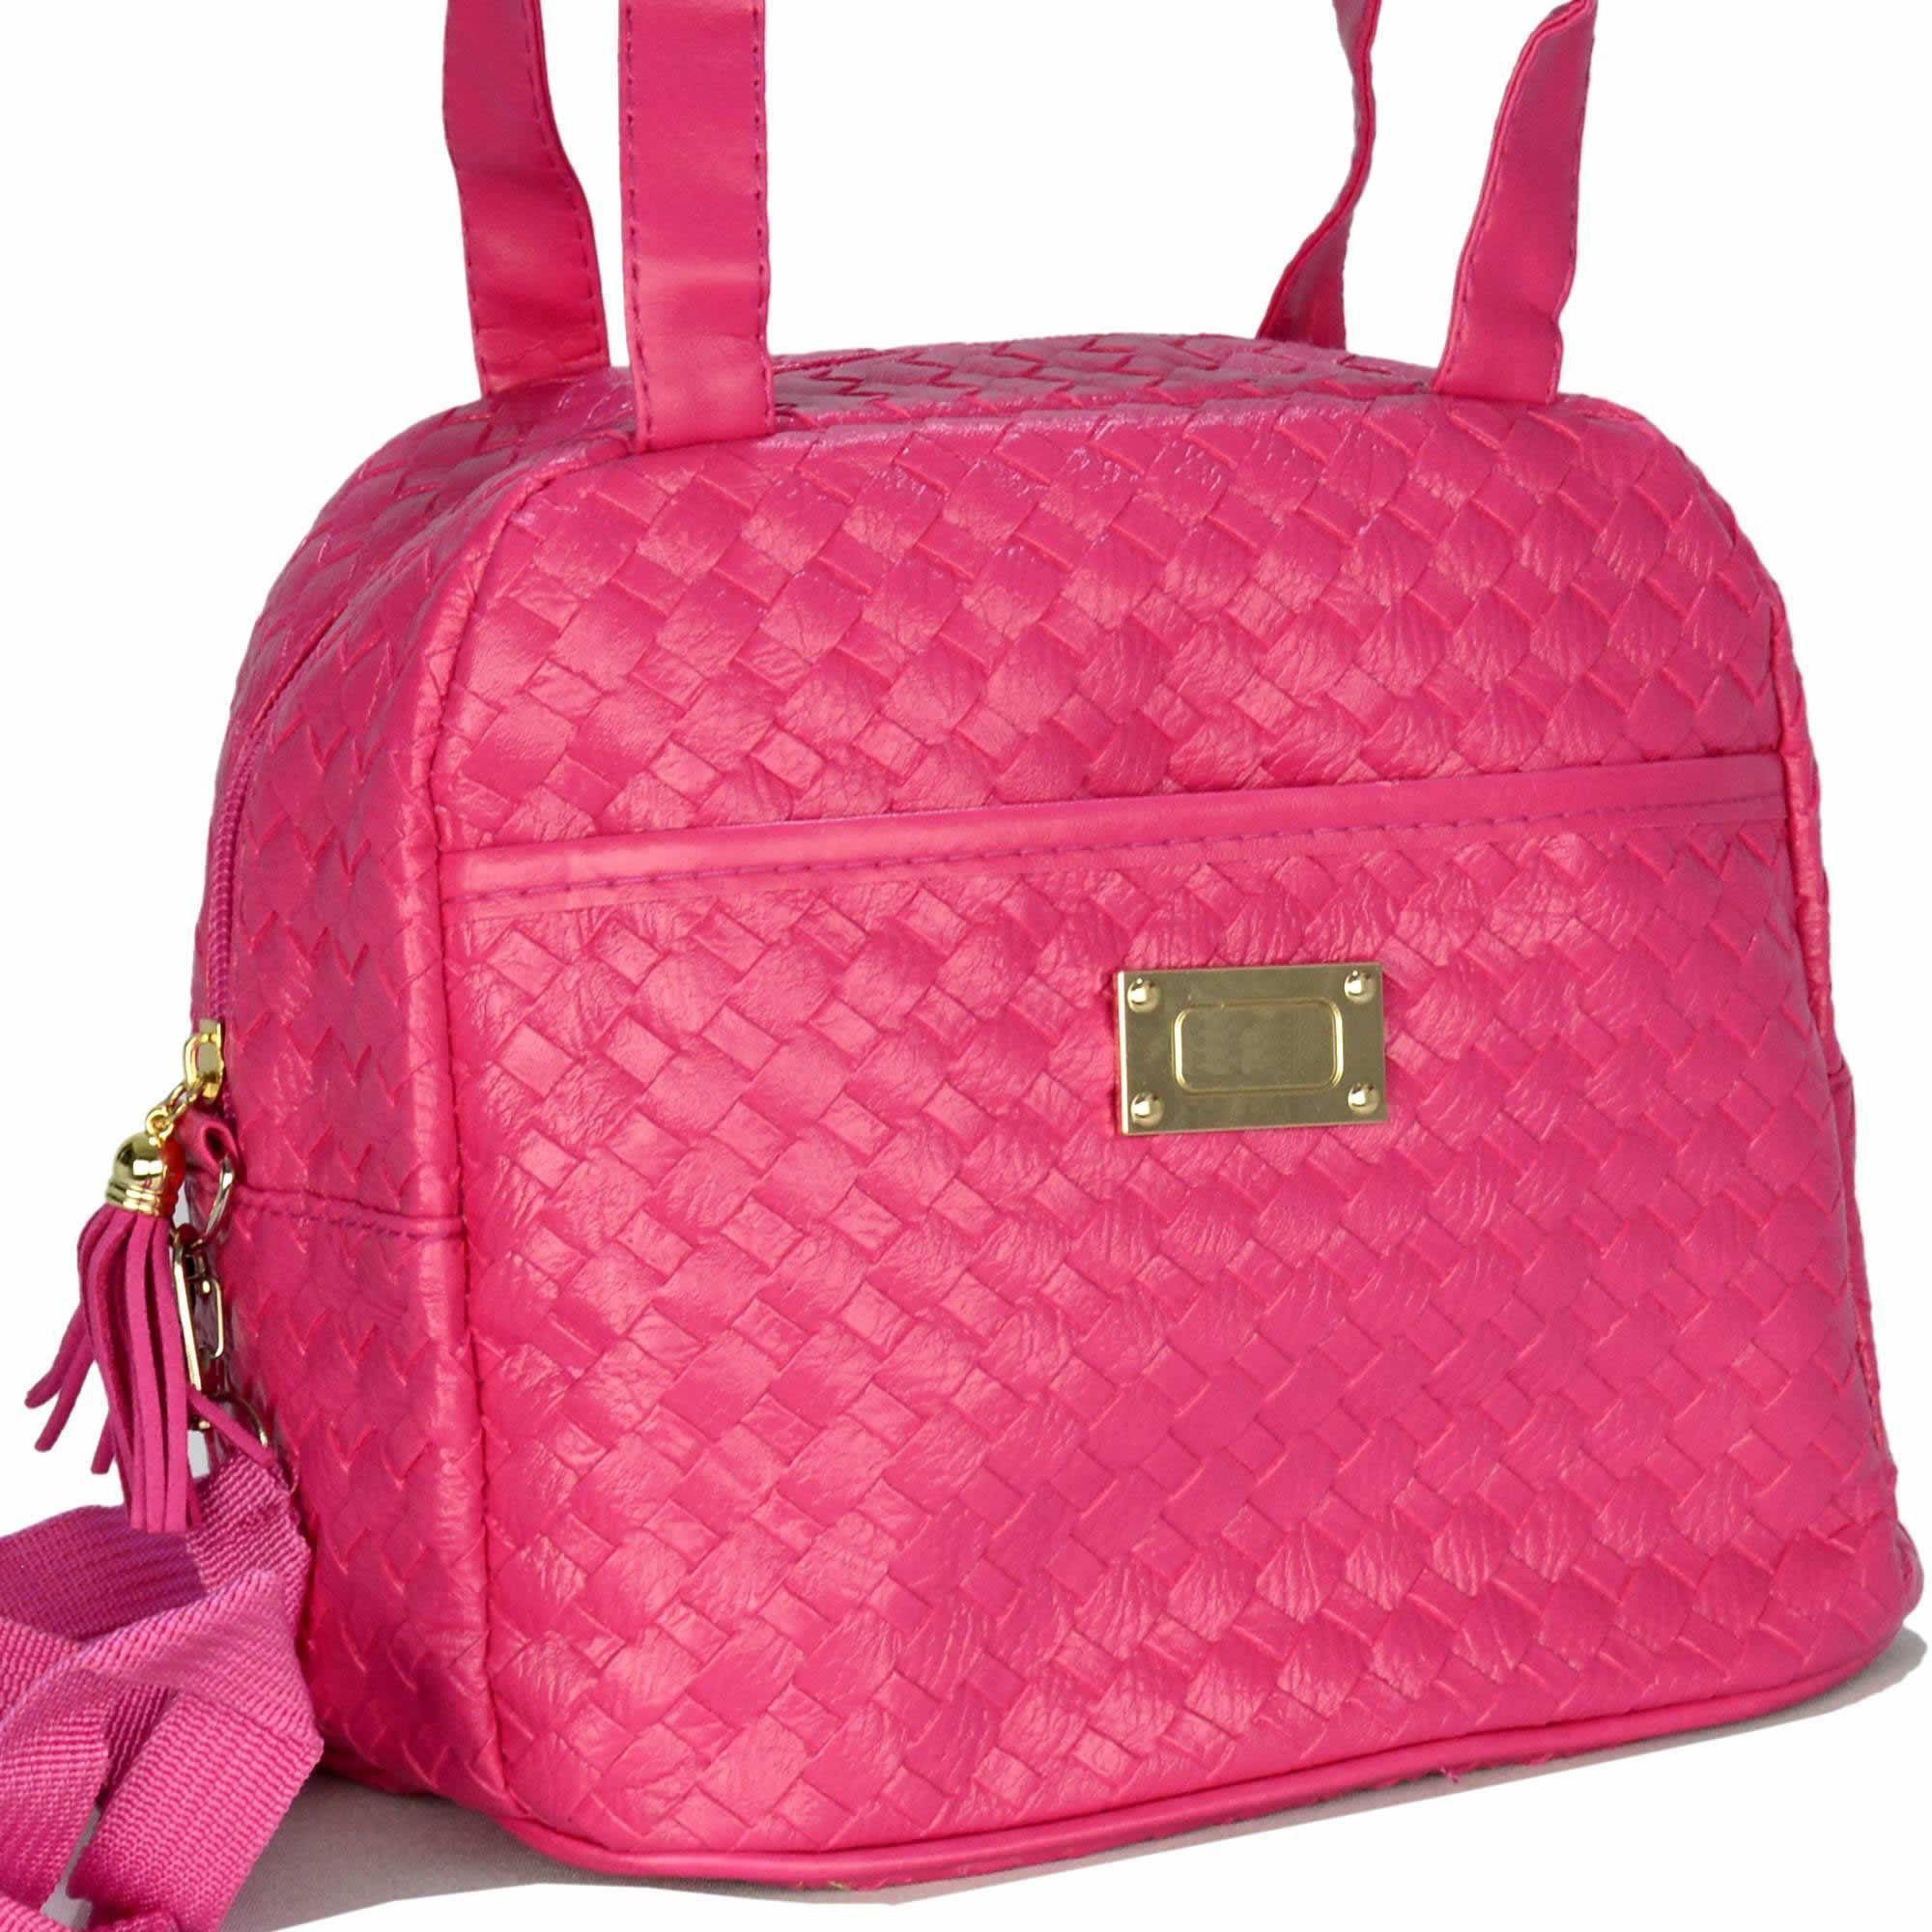 Nécessaire Feminina Bolsa Térmica Luxo Pink CBRN07912